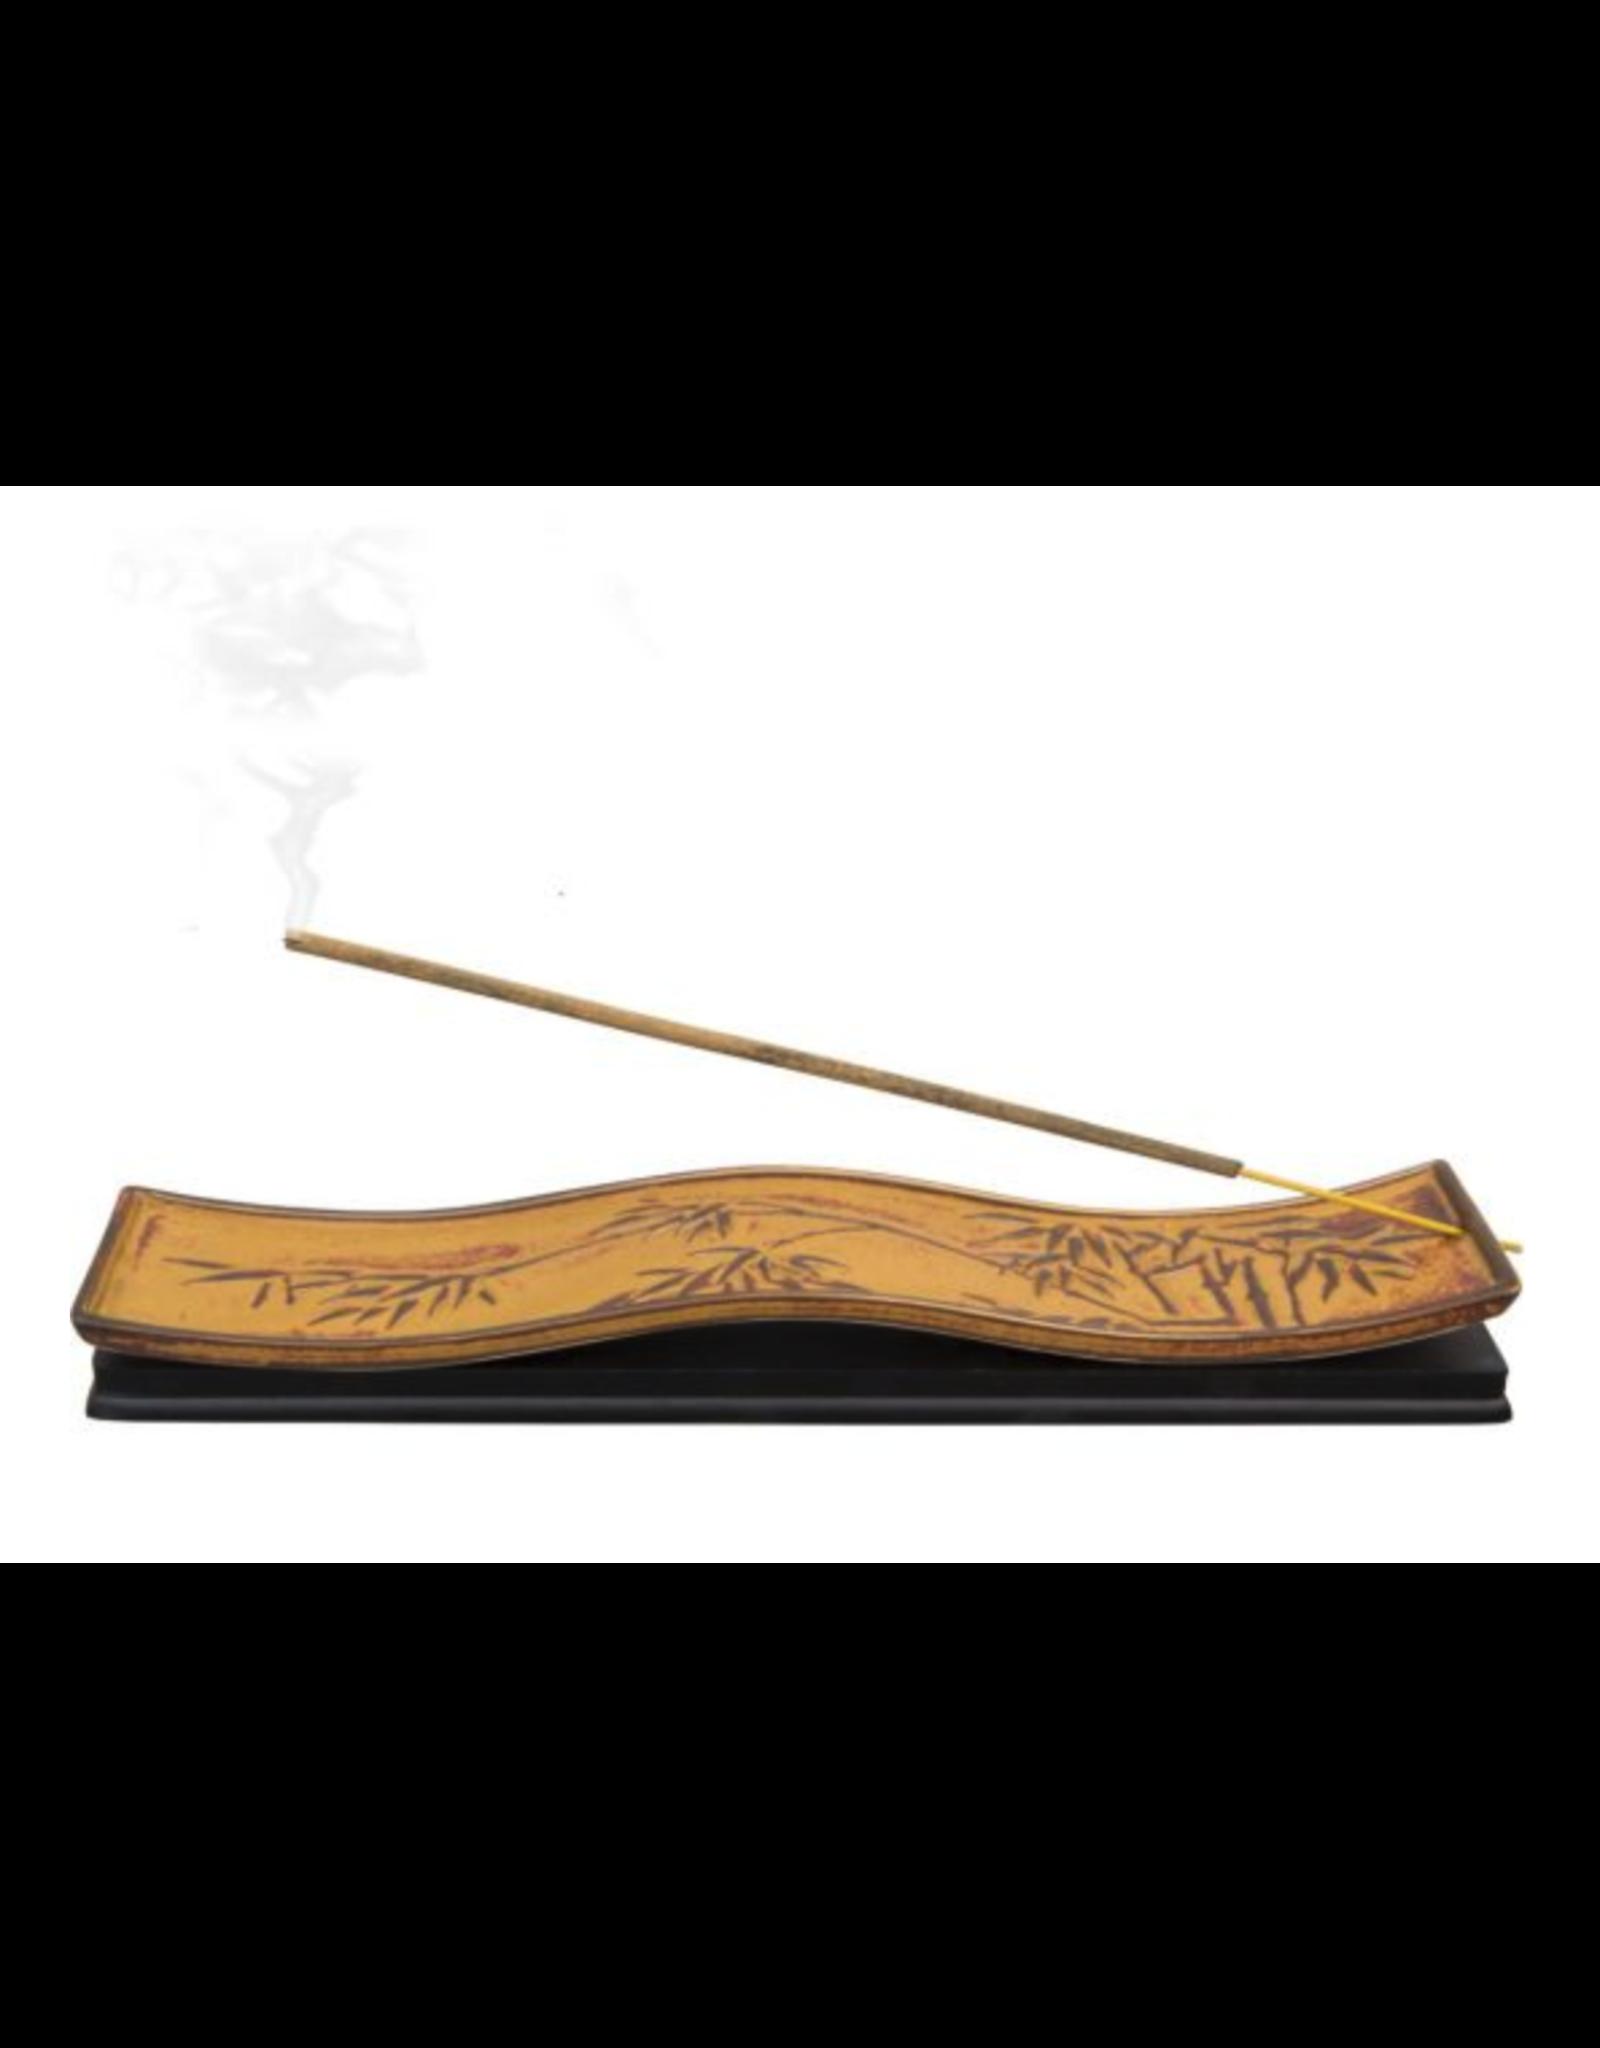 Bamboo Leaves Ceramic Incense Stick Burner